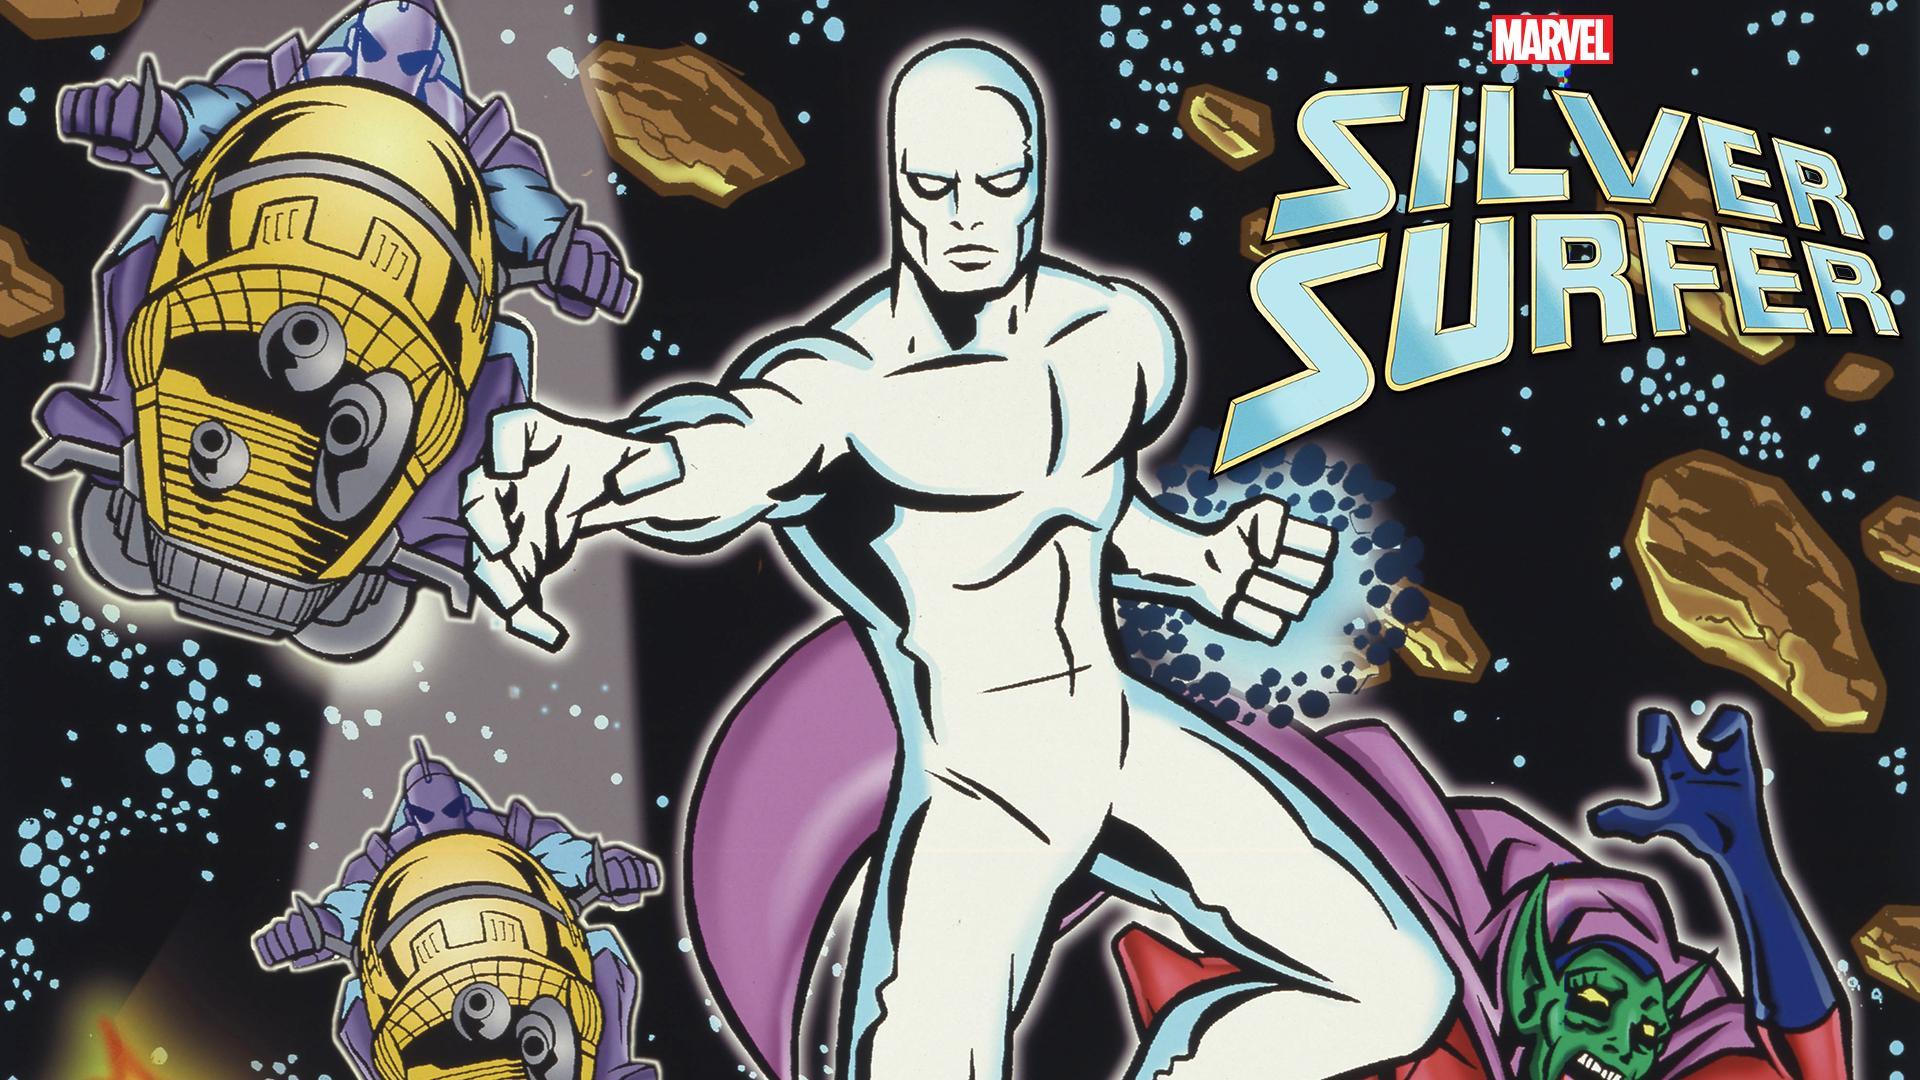 Silver Surfer (1998).jpg